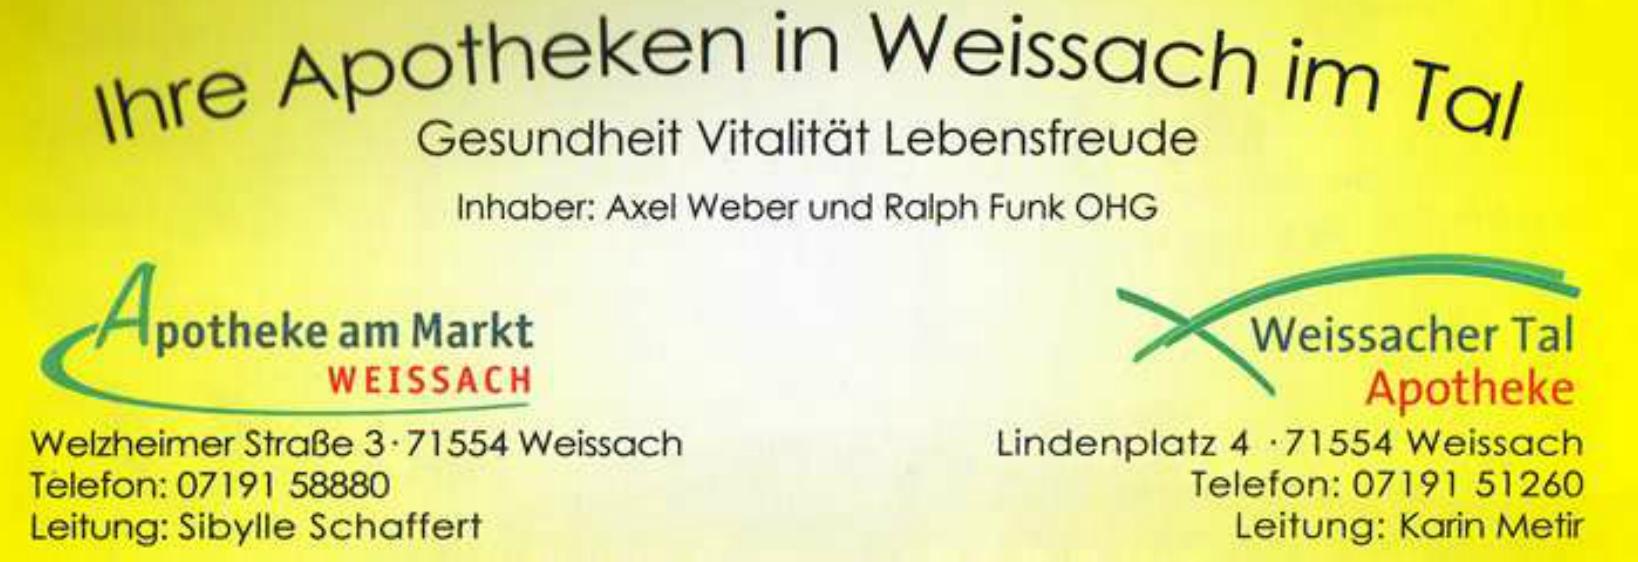 Weissacher Tal Apotheke OHG